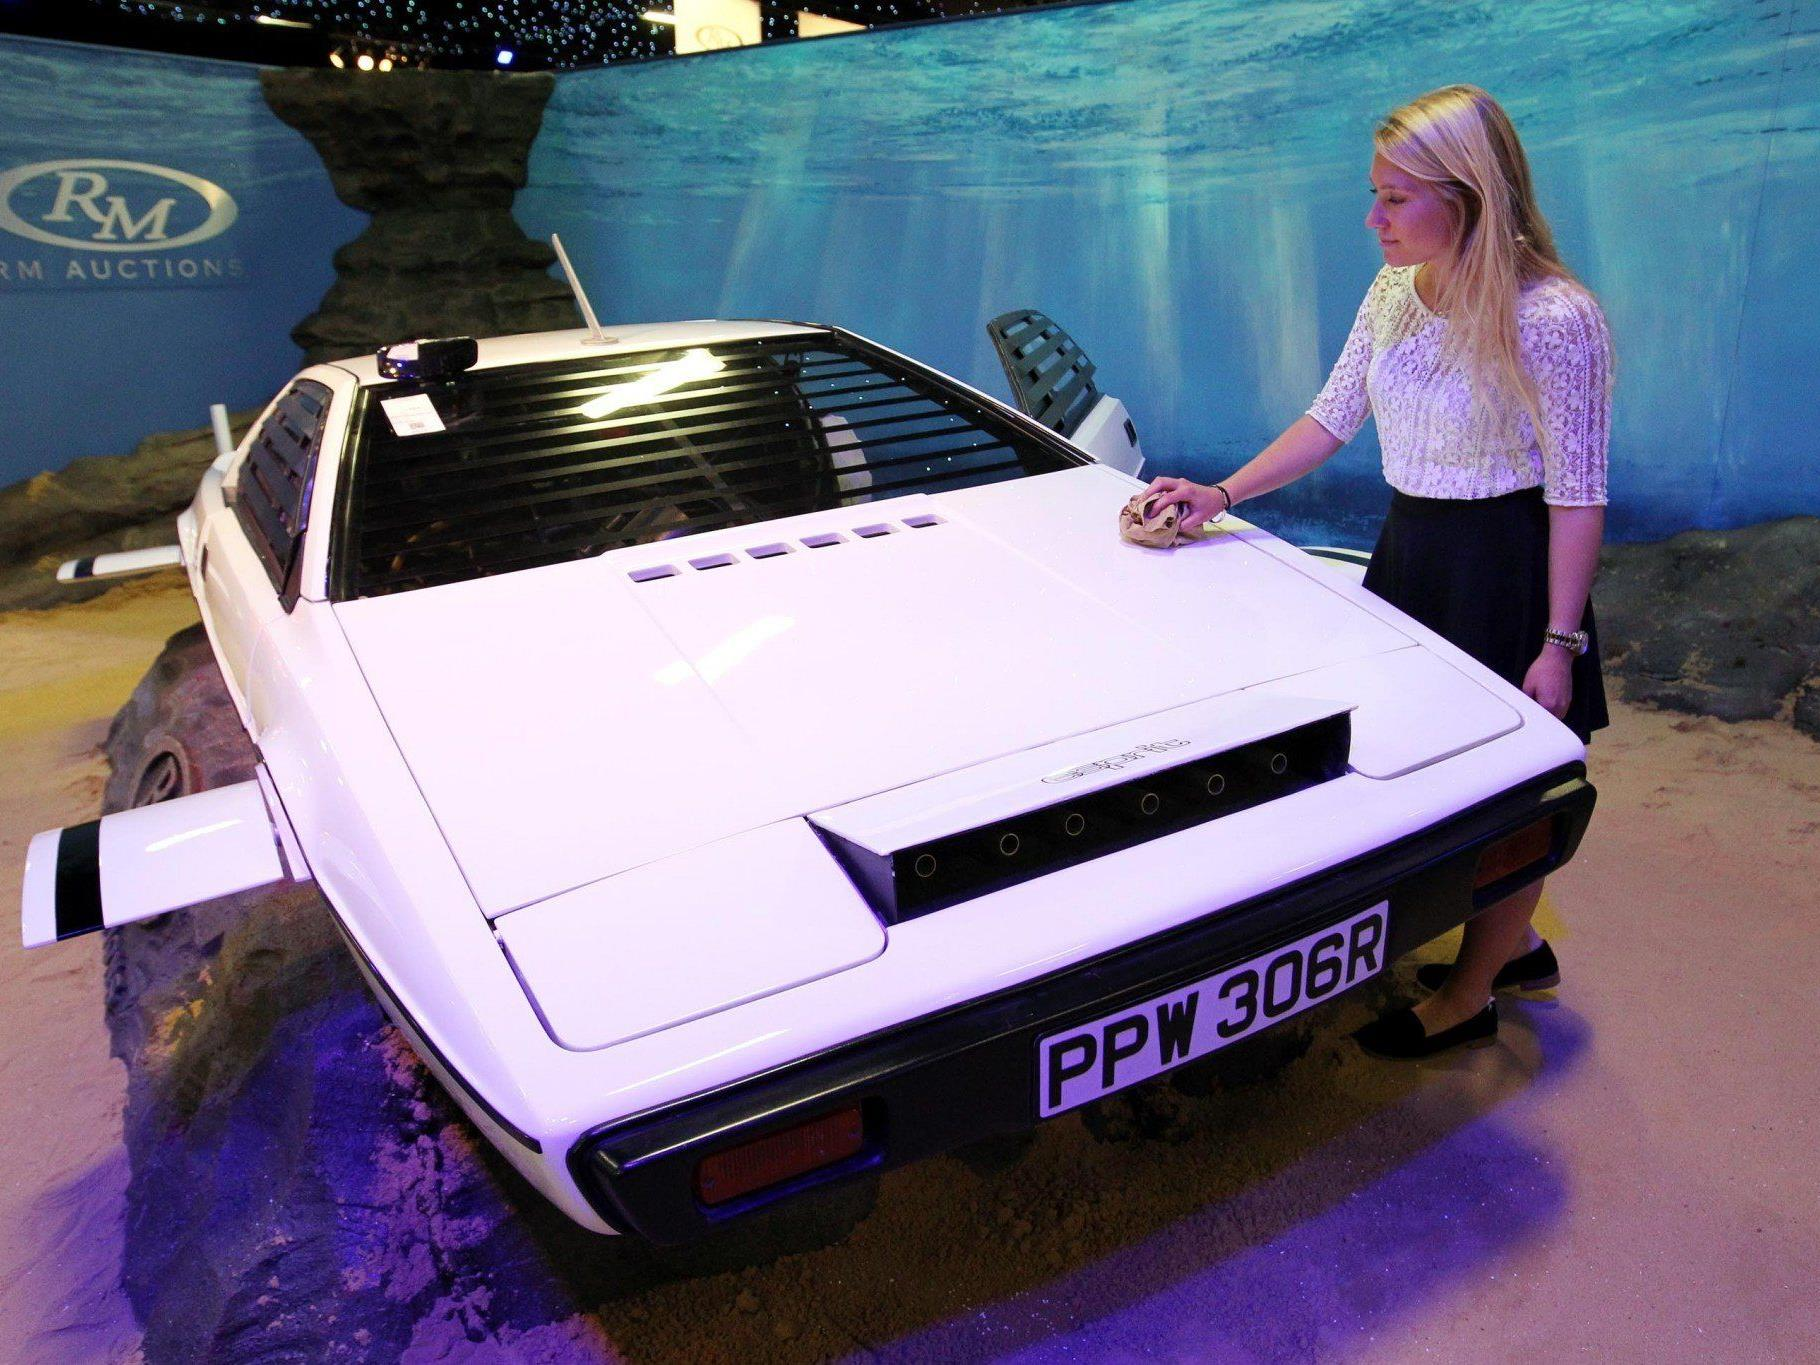 Bieterkampf um Bond-Lotus Esprit: Telefonbieter erhielt Zuschlag.